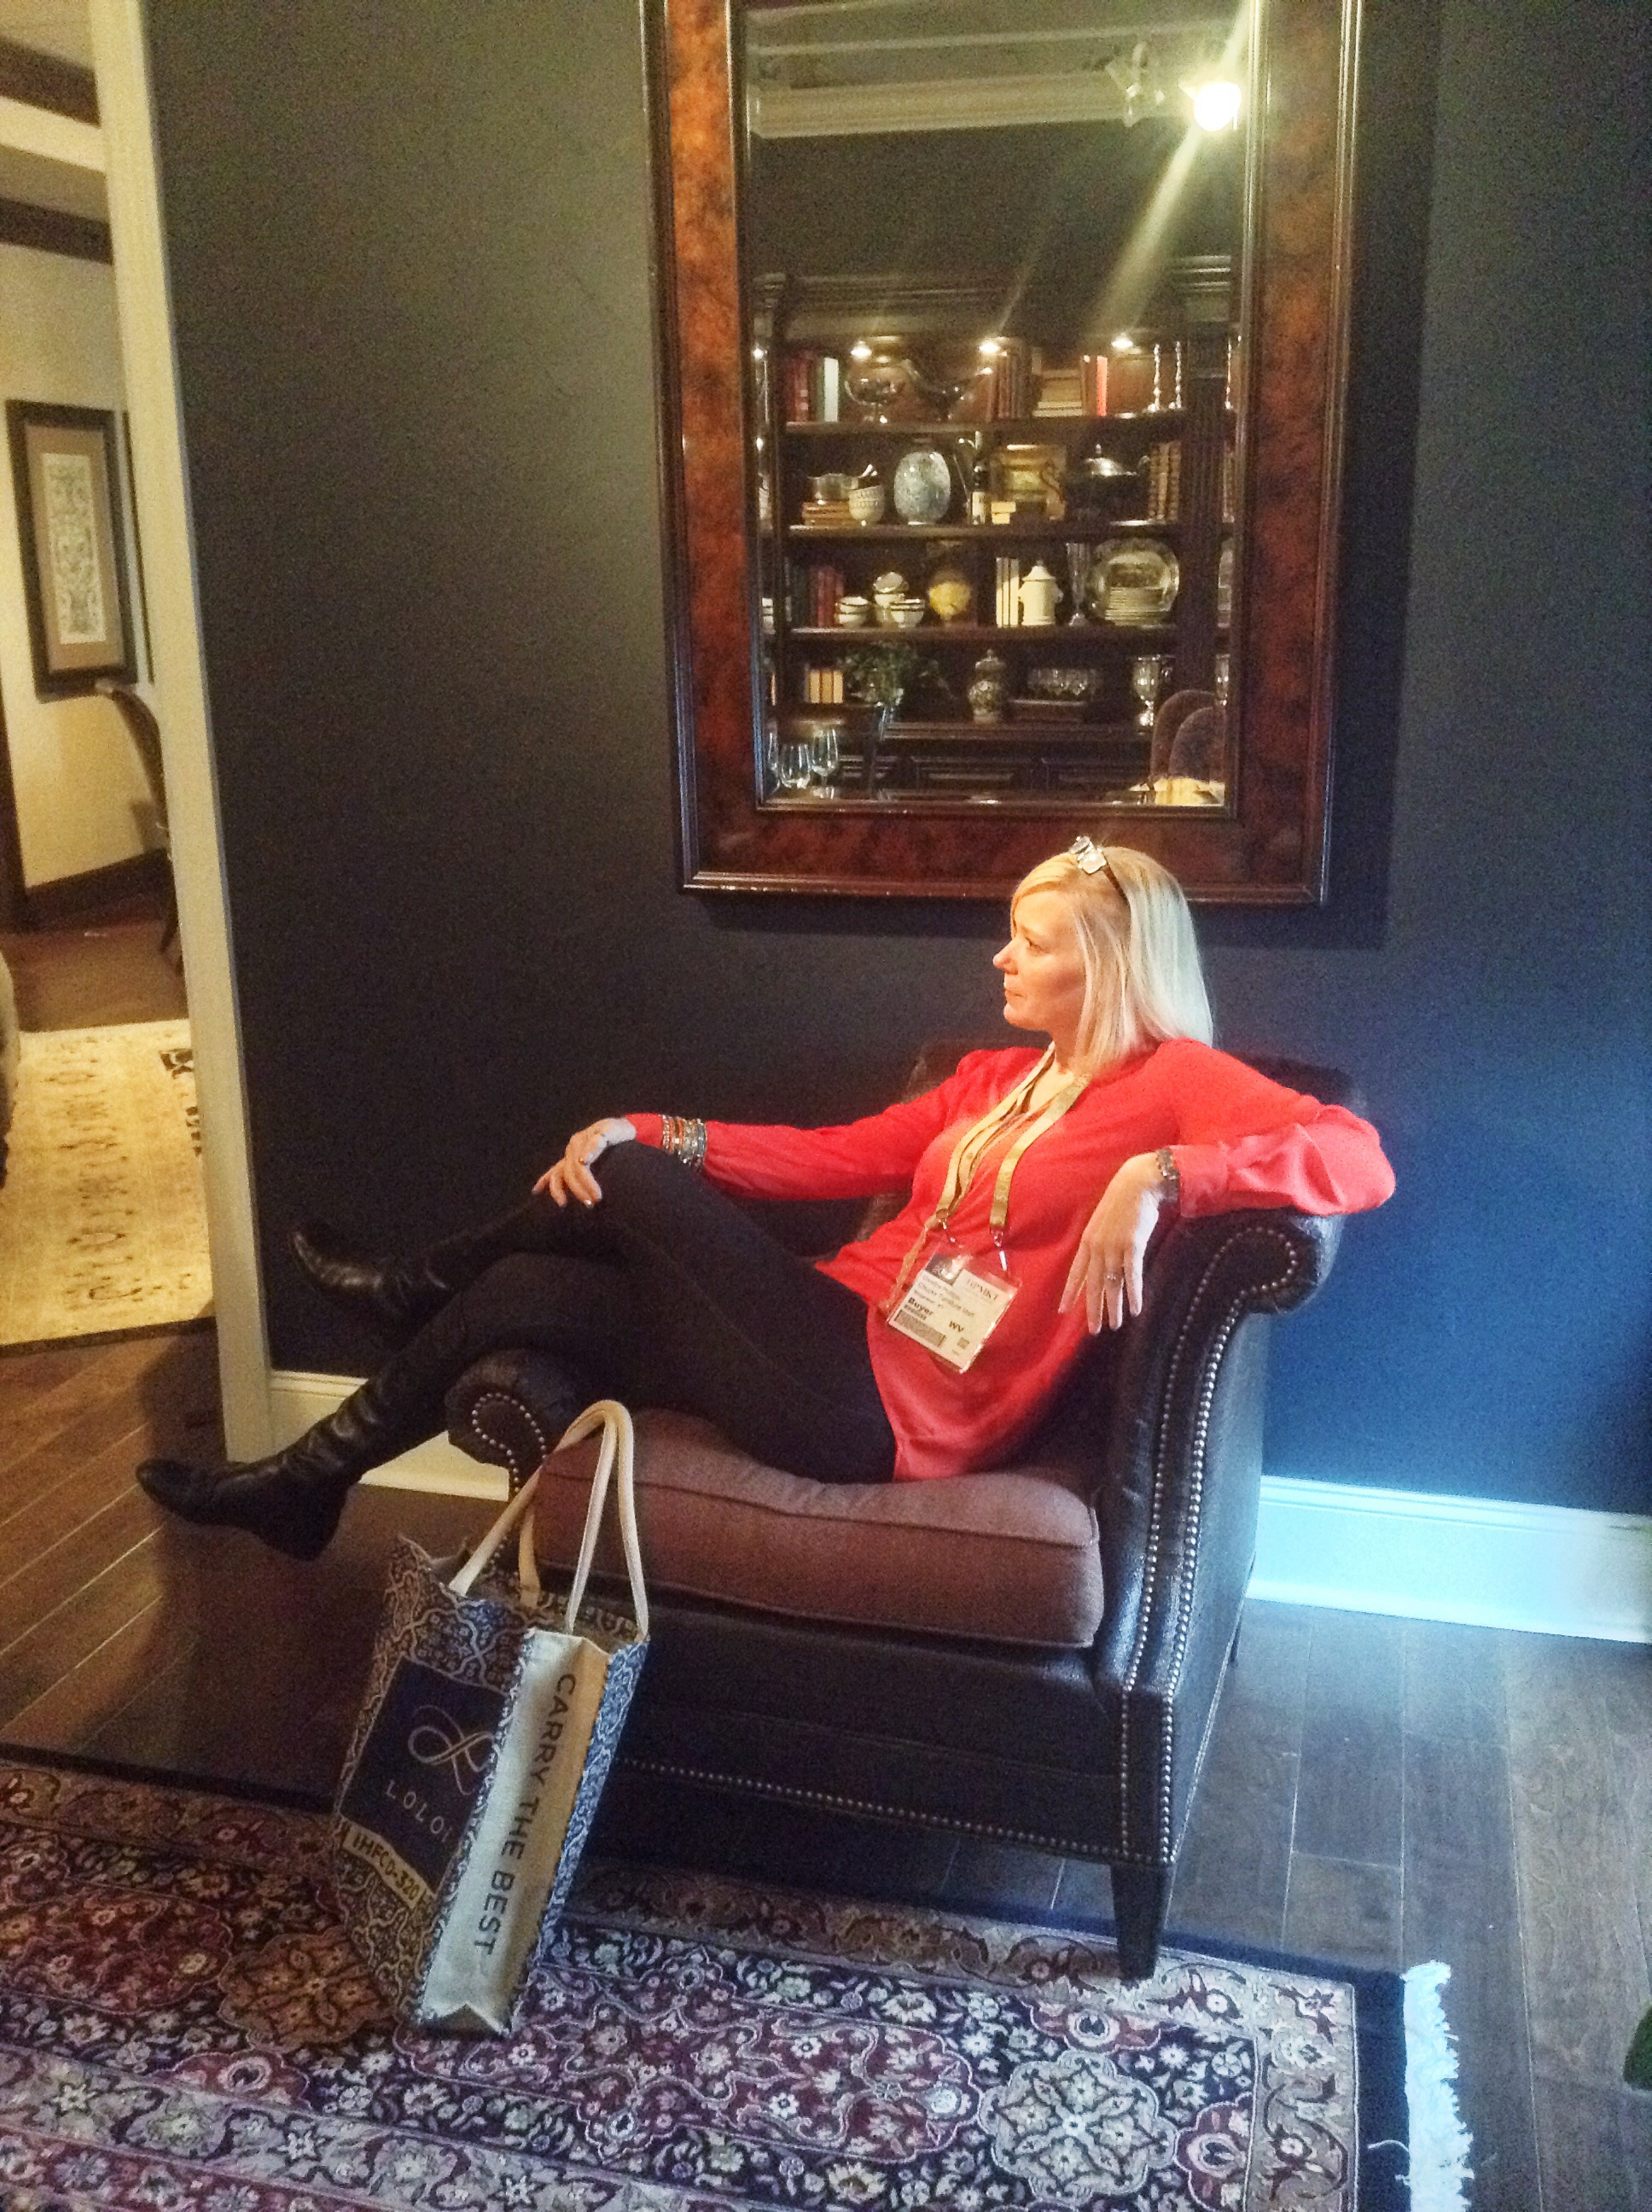 Chuck S Furniture Store Morgantown Wv